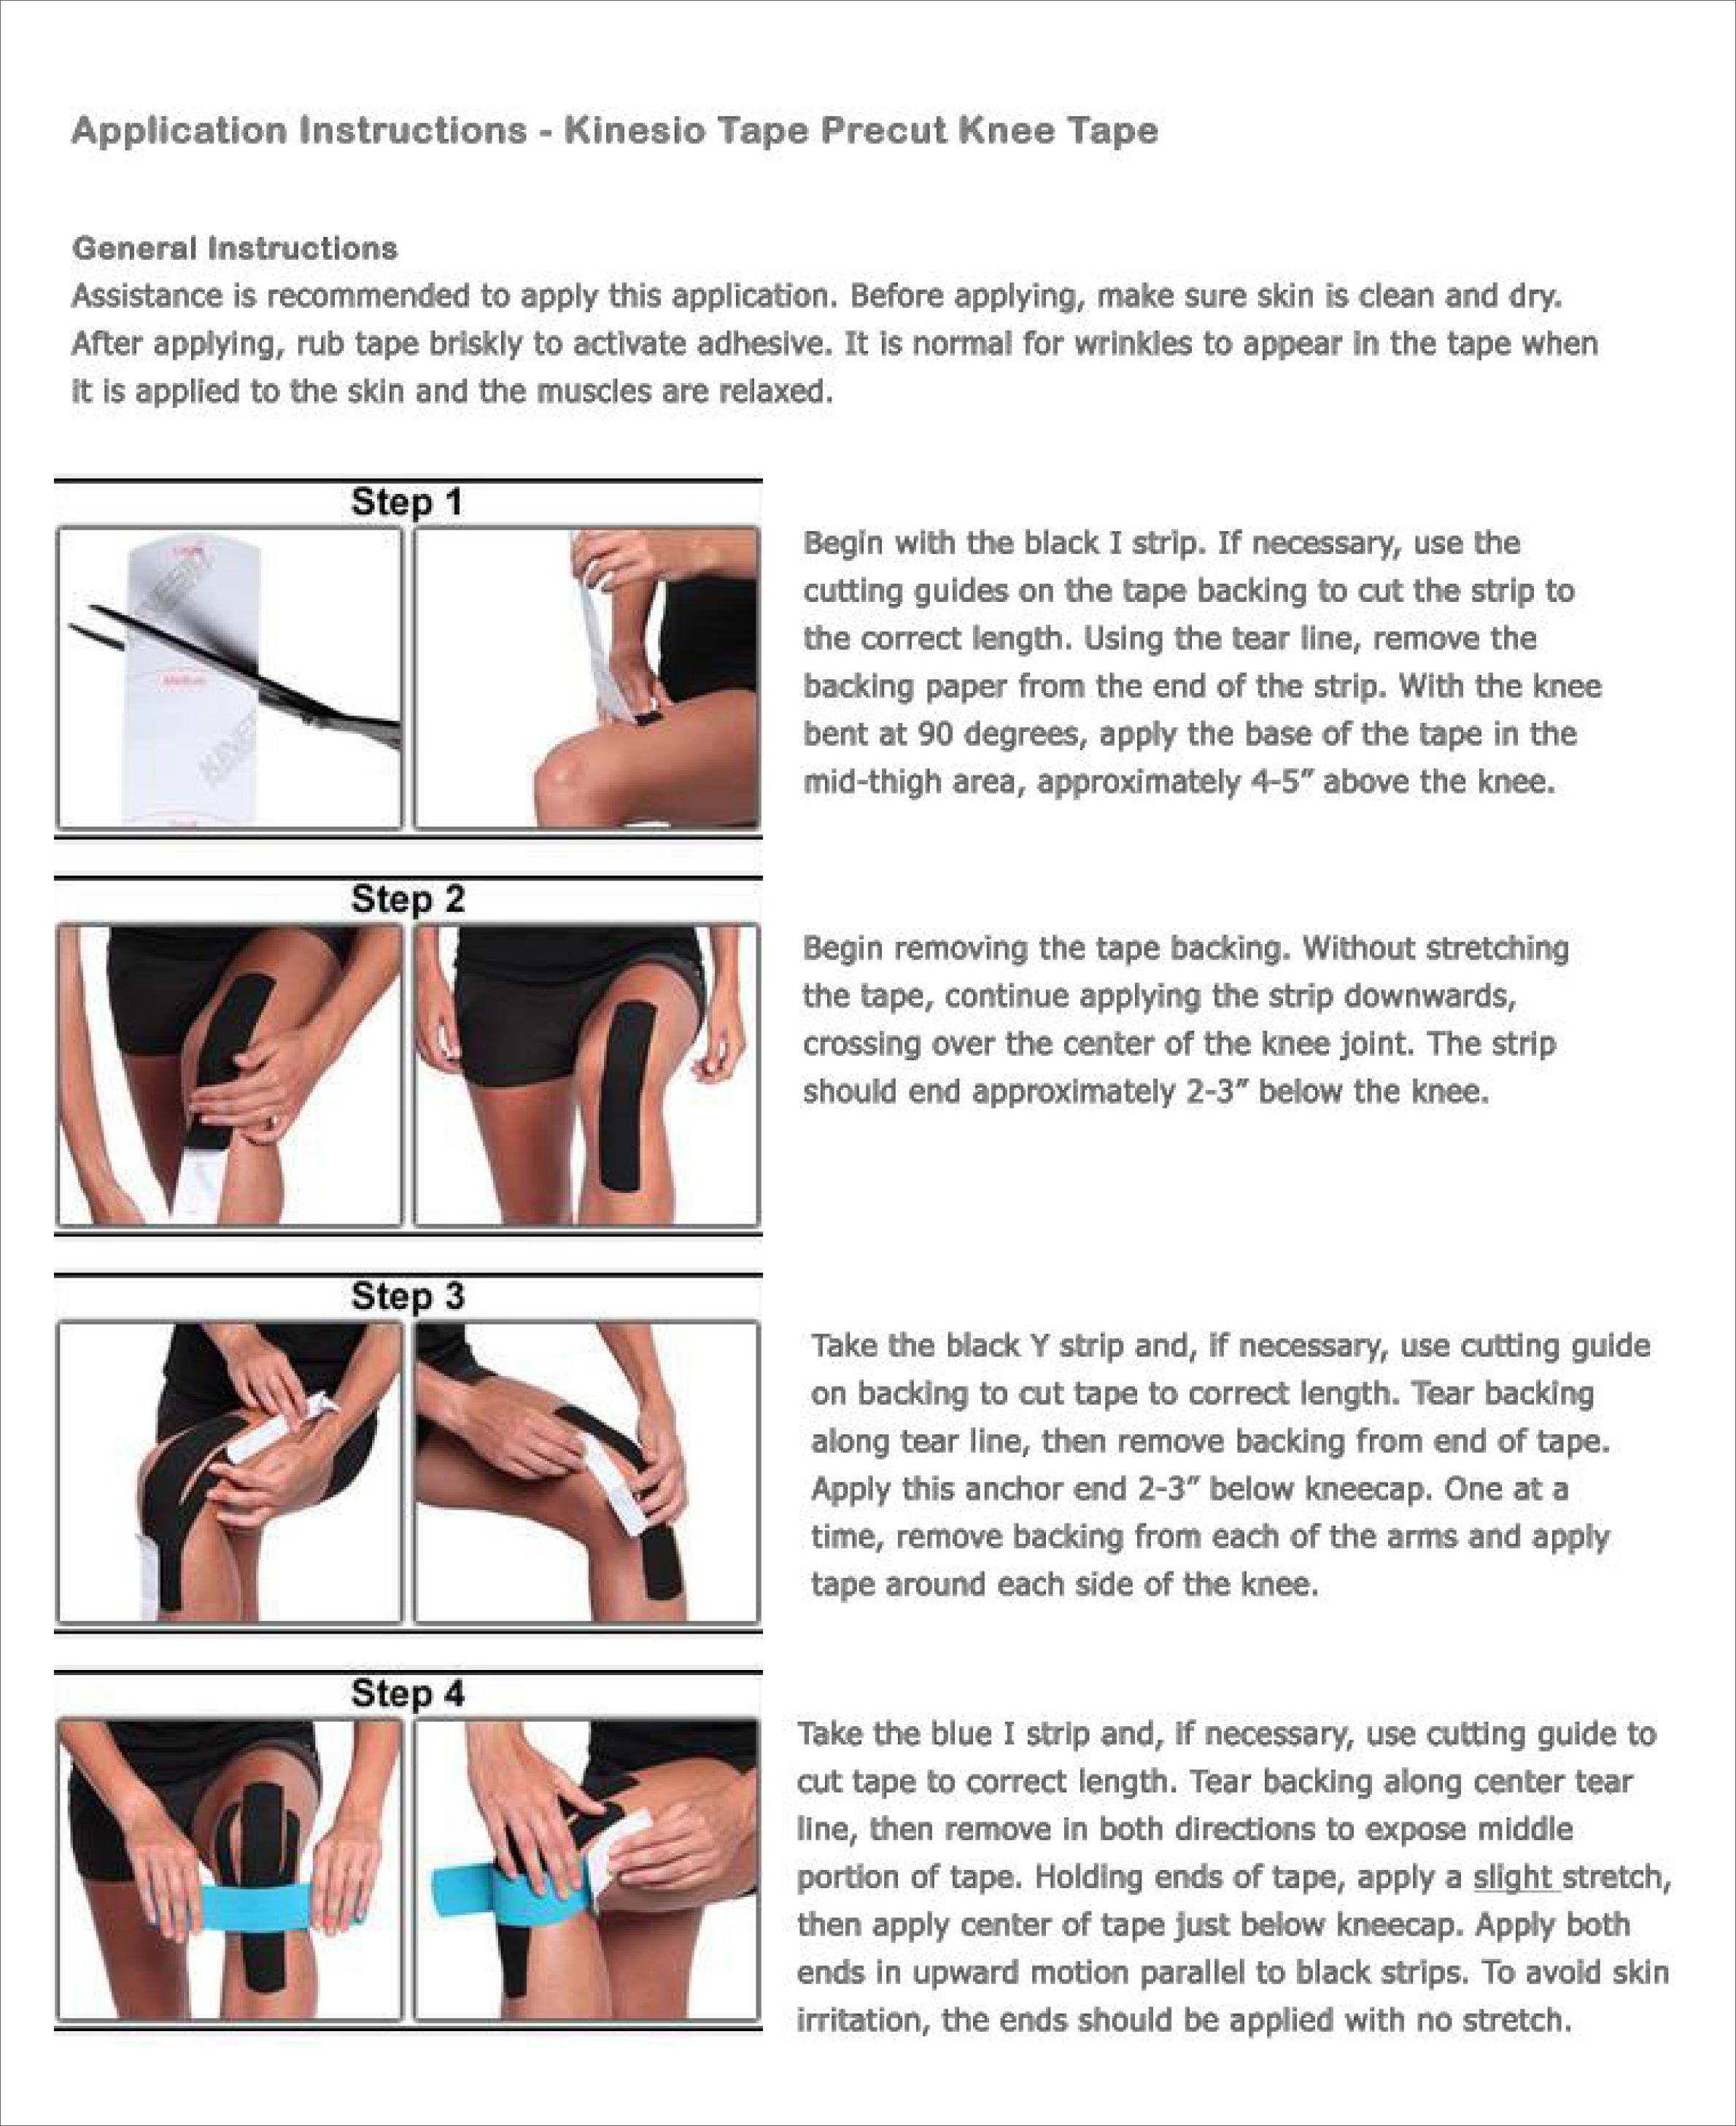 kinesio-instructions-precut-knee